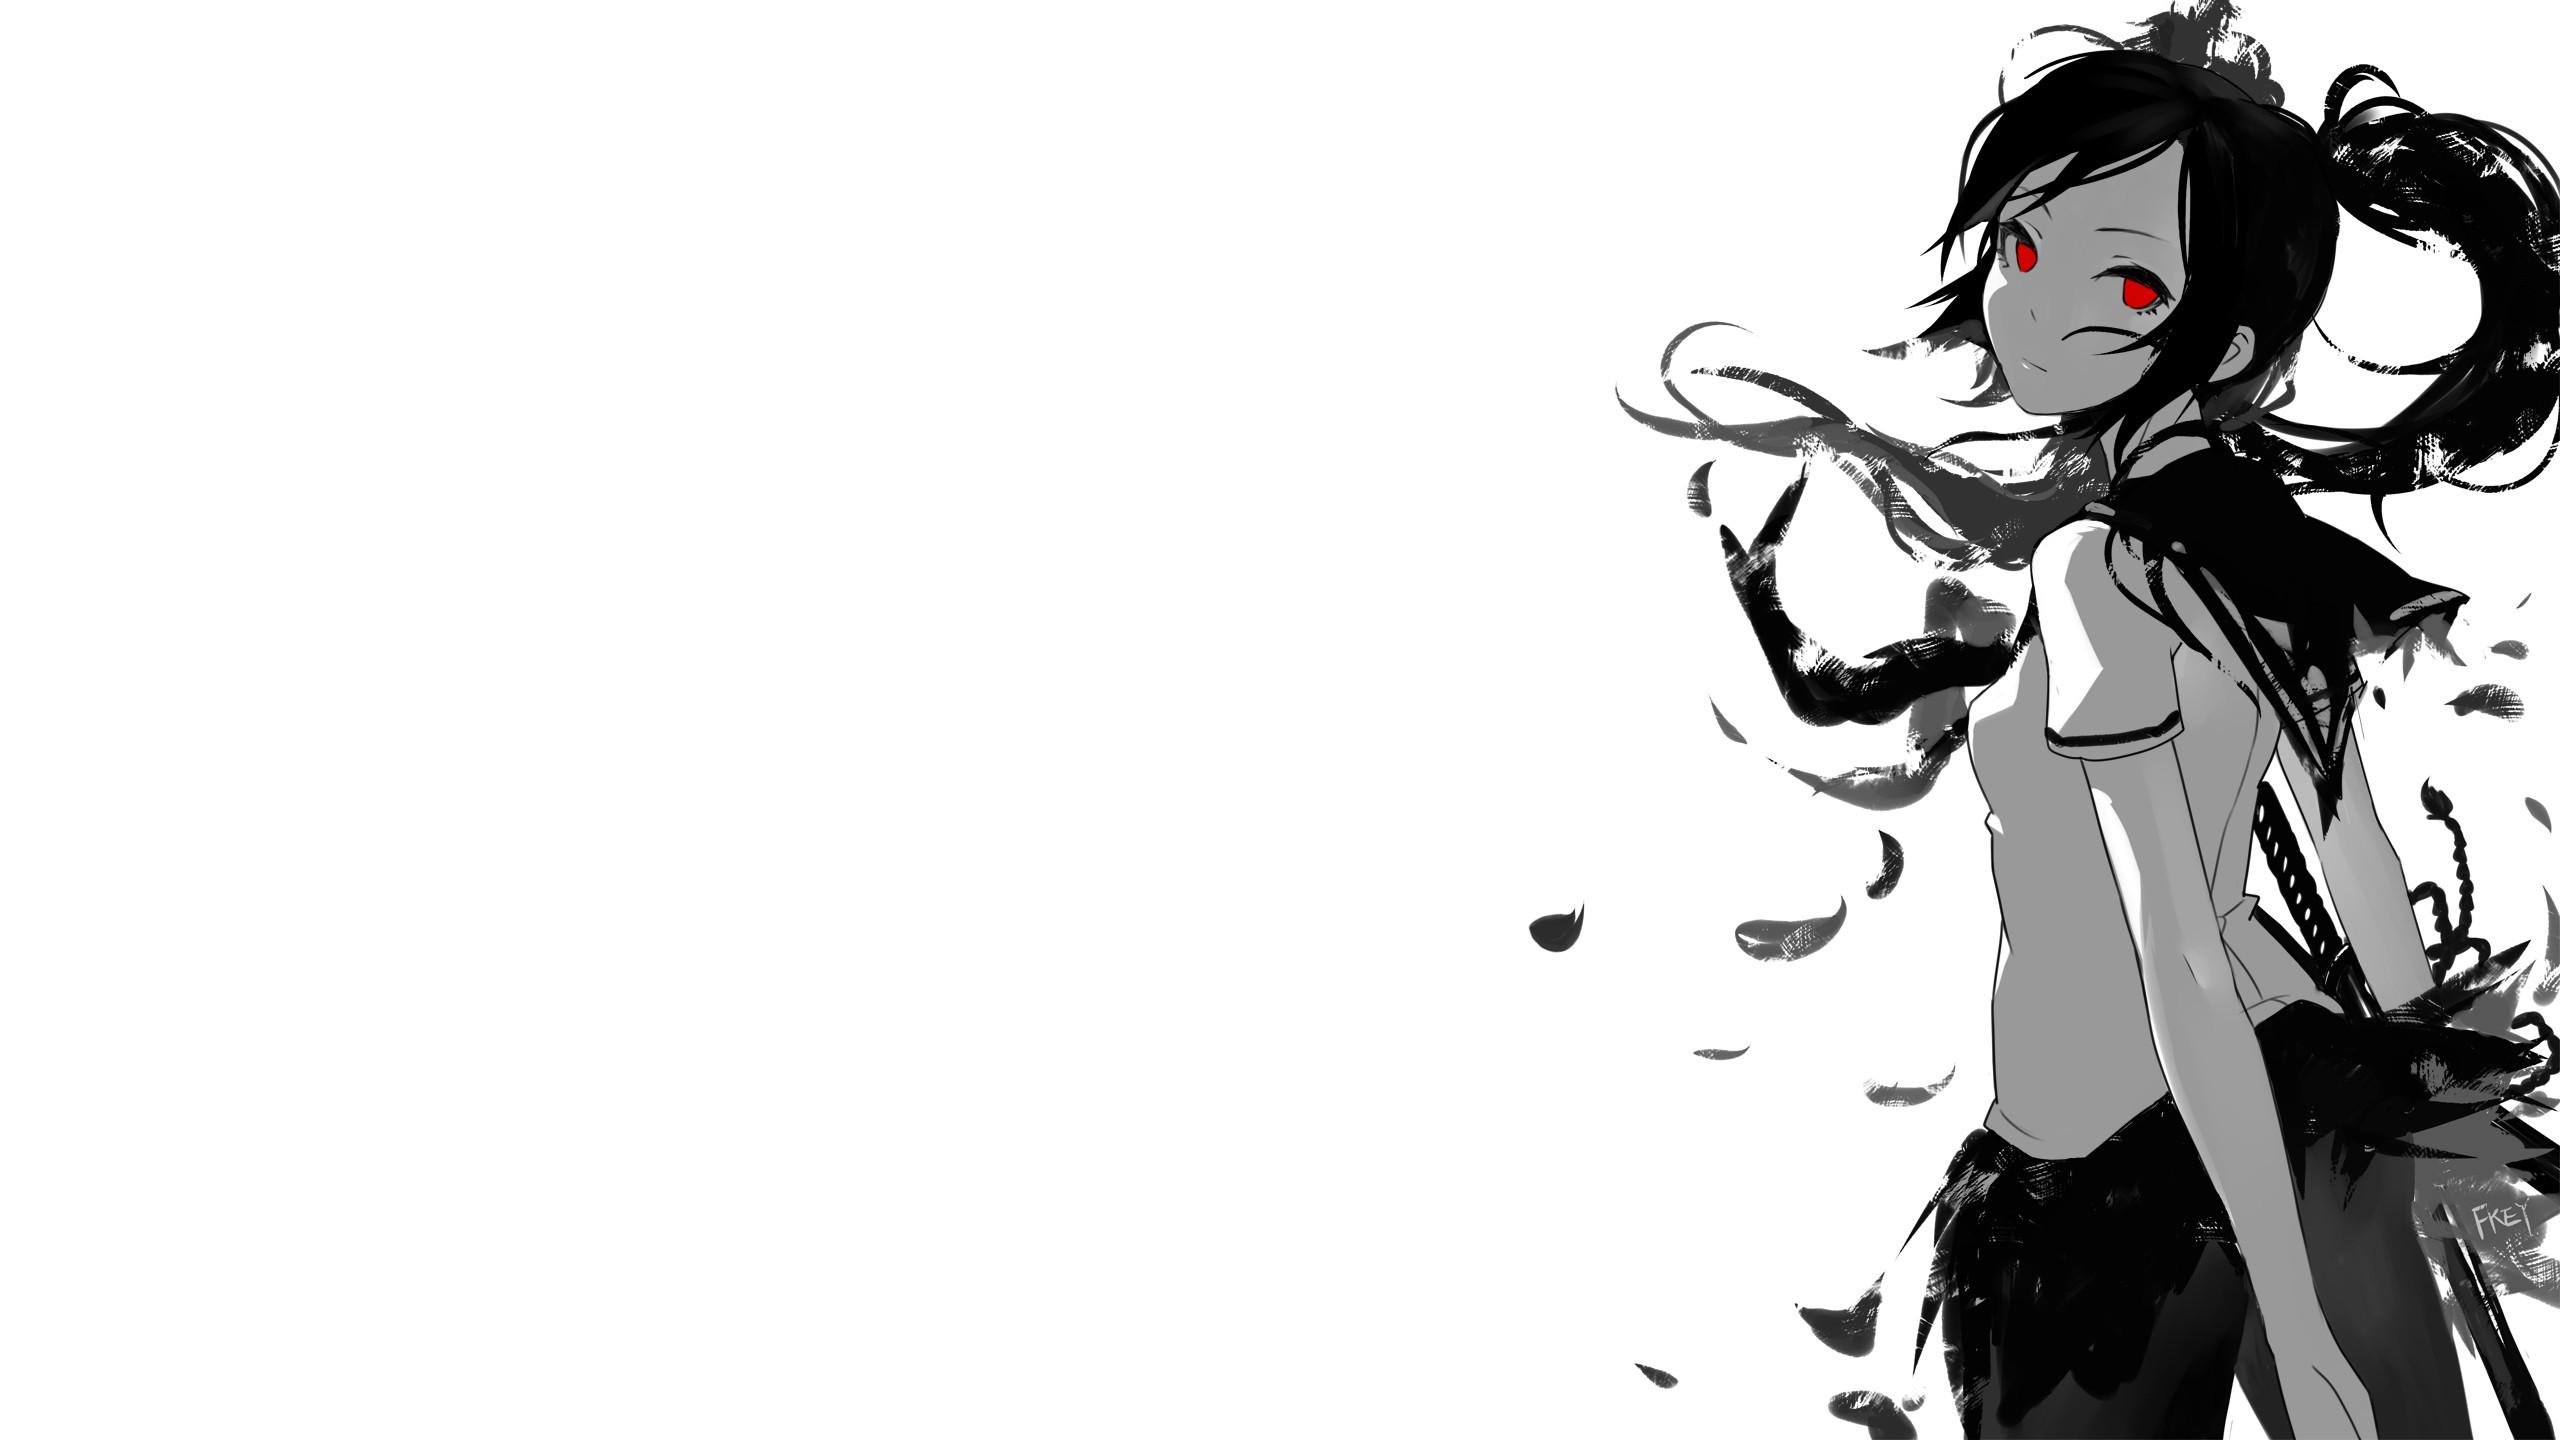 879666 Title Anime Original Wallpaper Anime Girl White And Black Colours 2560x1440 Download Hd Wallpaper Wallpapertip Otomachi una rainy night vocaloid. 879666 title anime original wallpaper